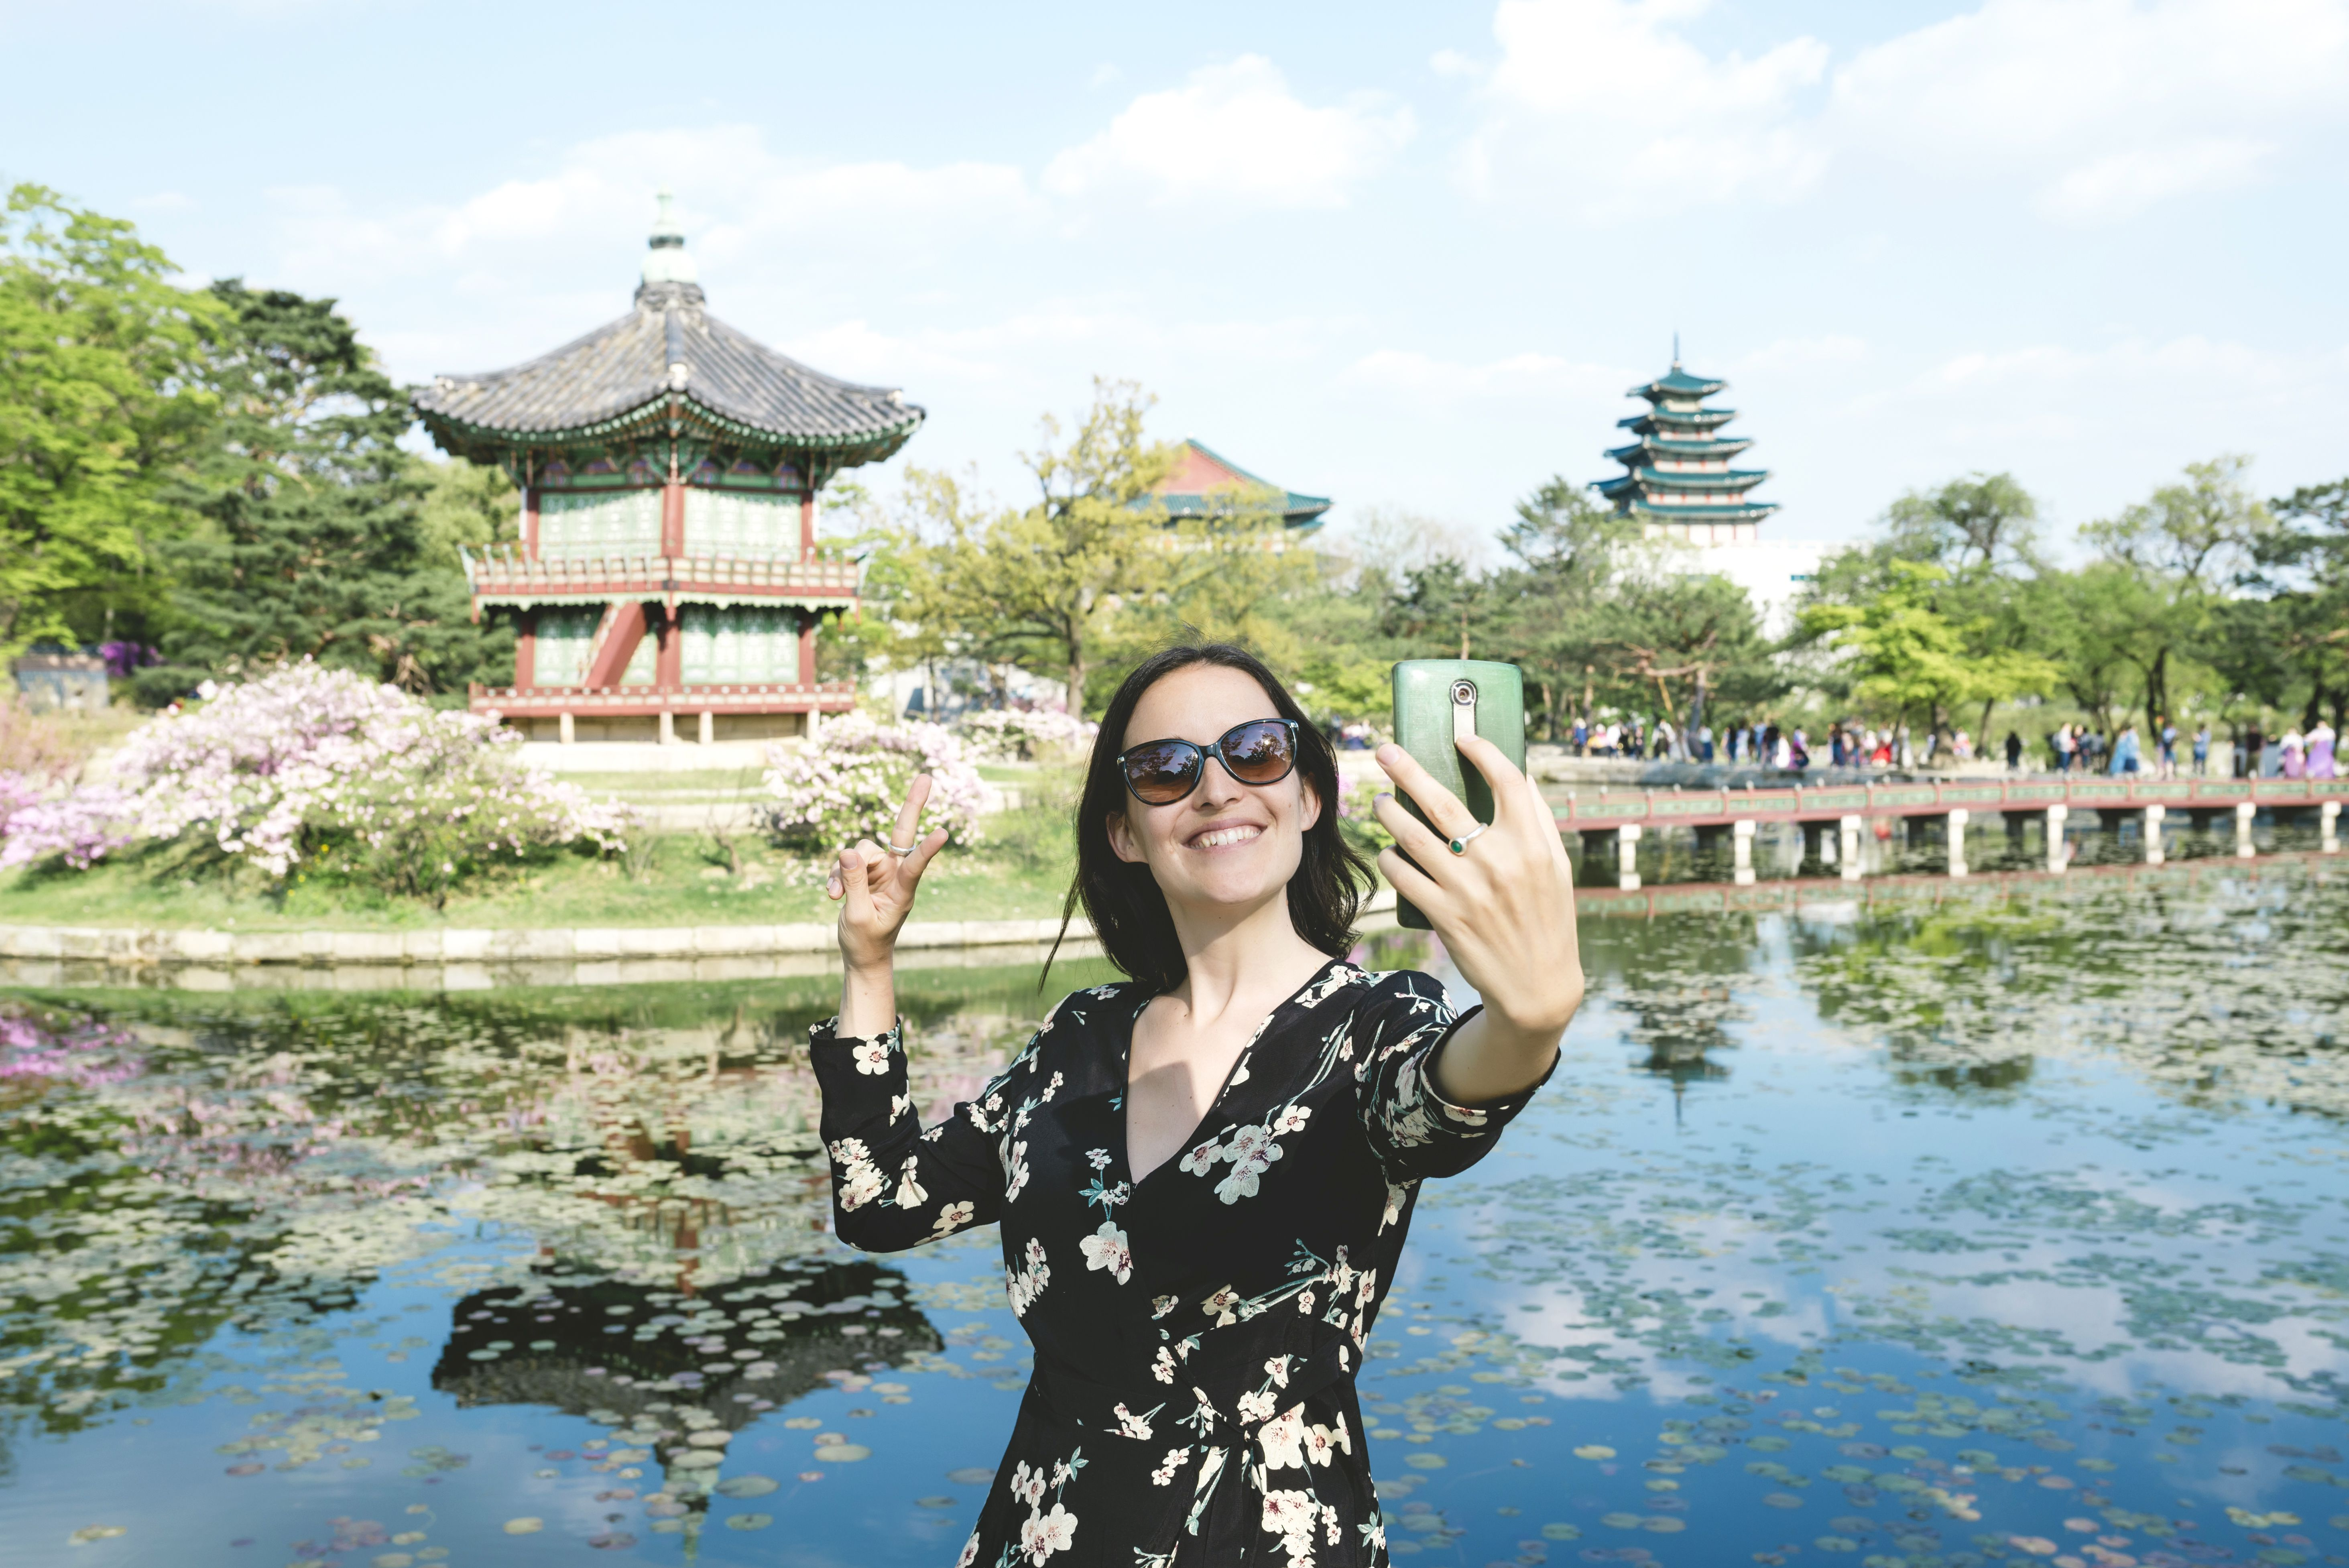 Best South Korean Tourism Websites For Travel Pros